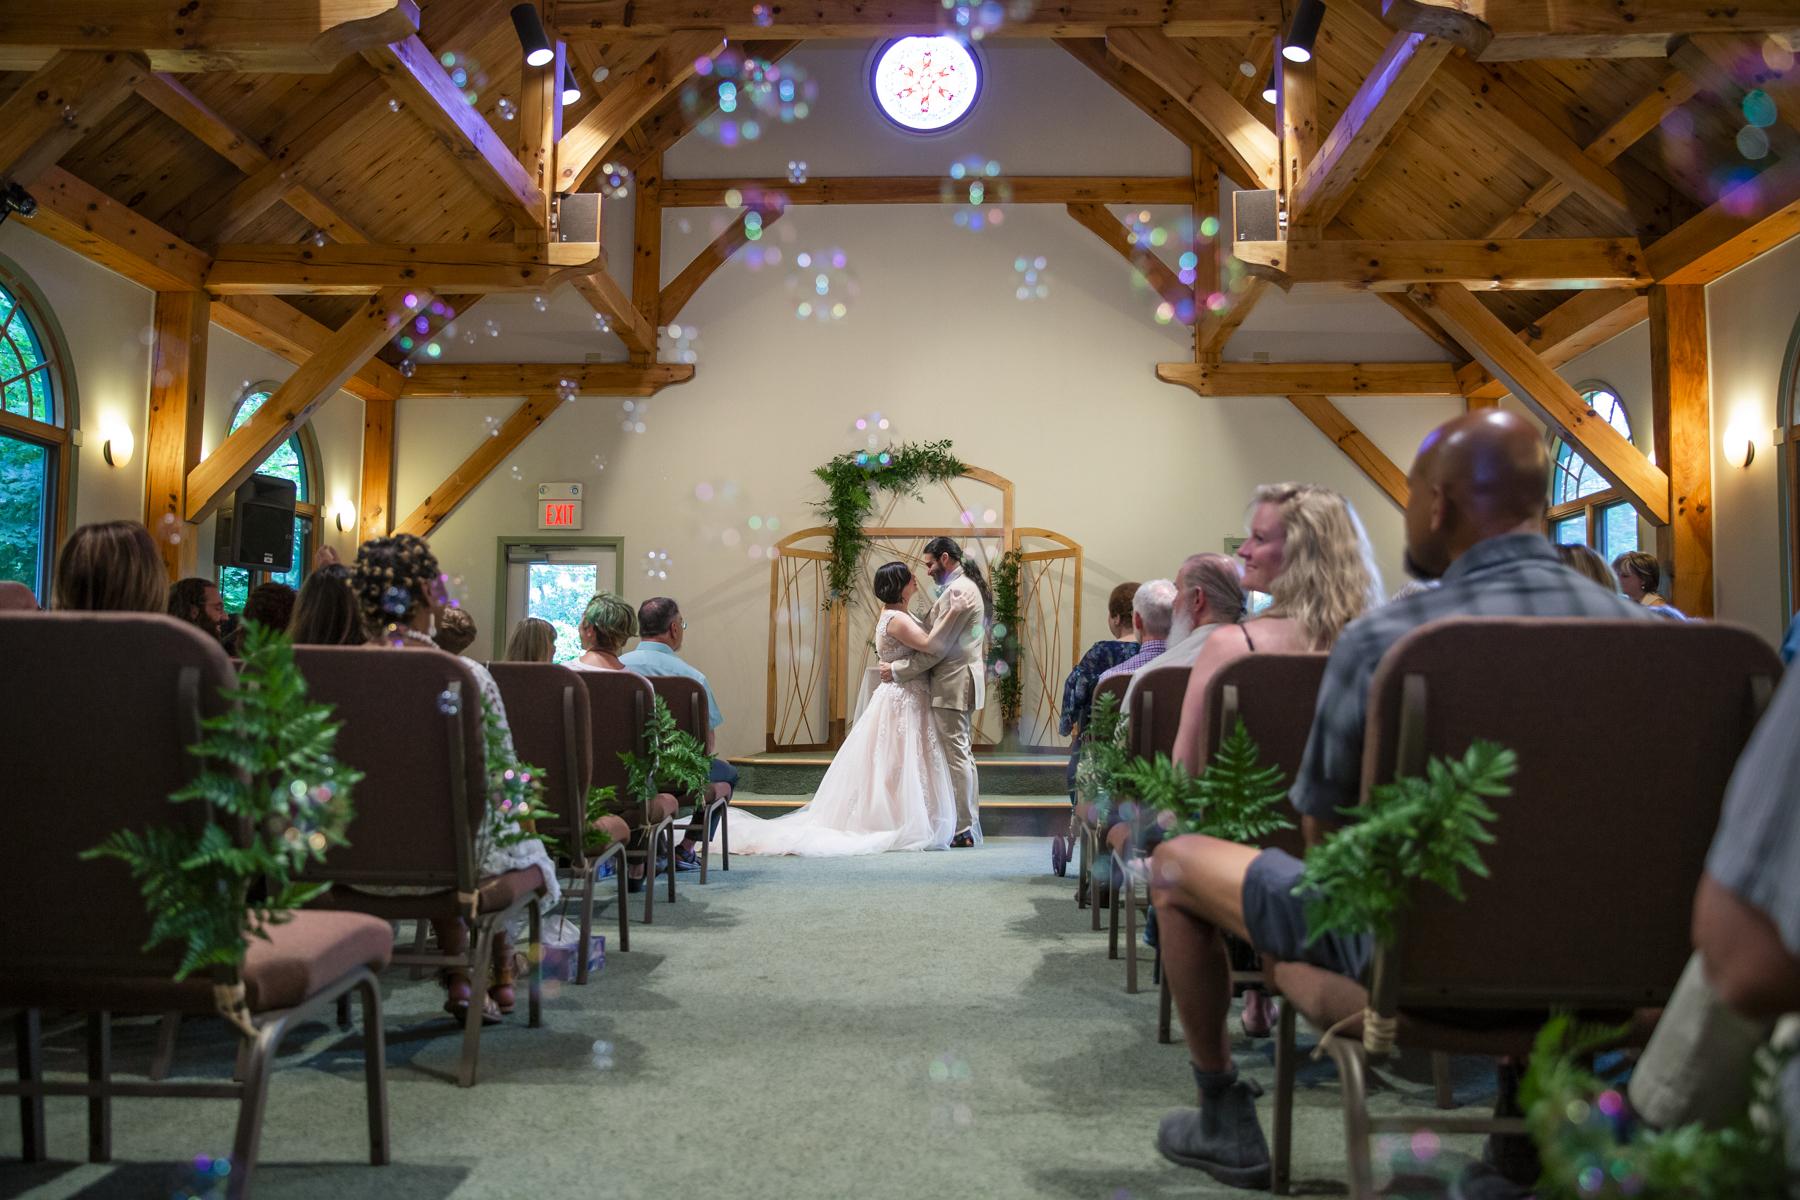 Avyanna and Phoenix Wedding- Photos by Studio Misha_BLOG-200.jpg